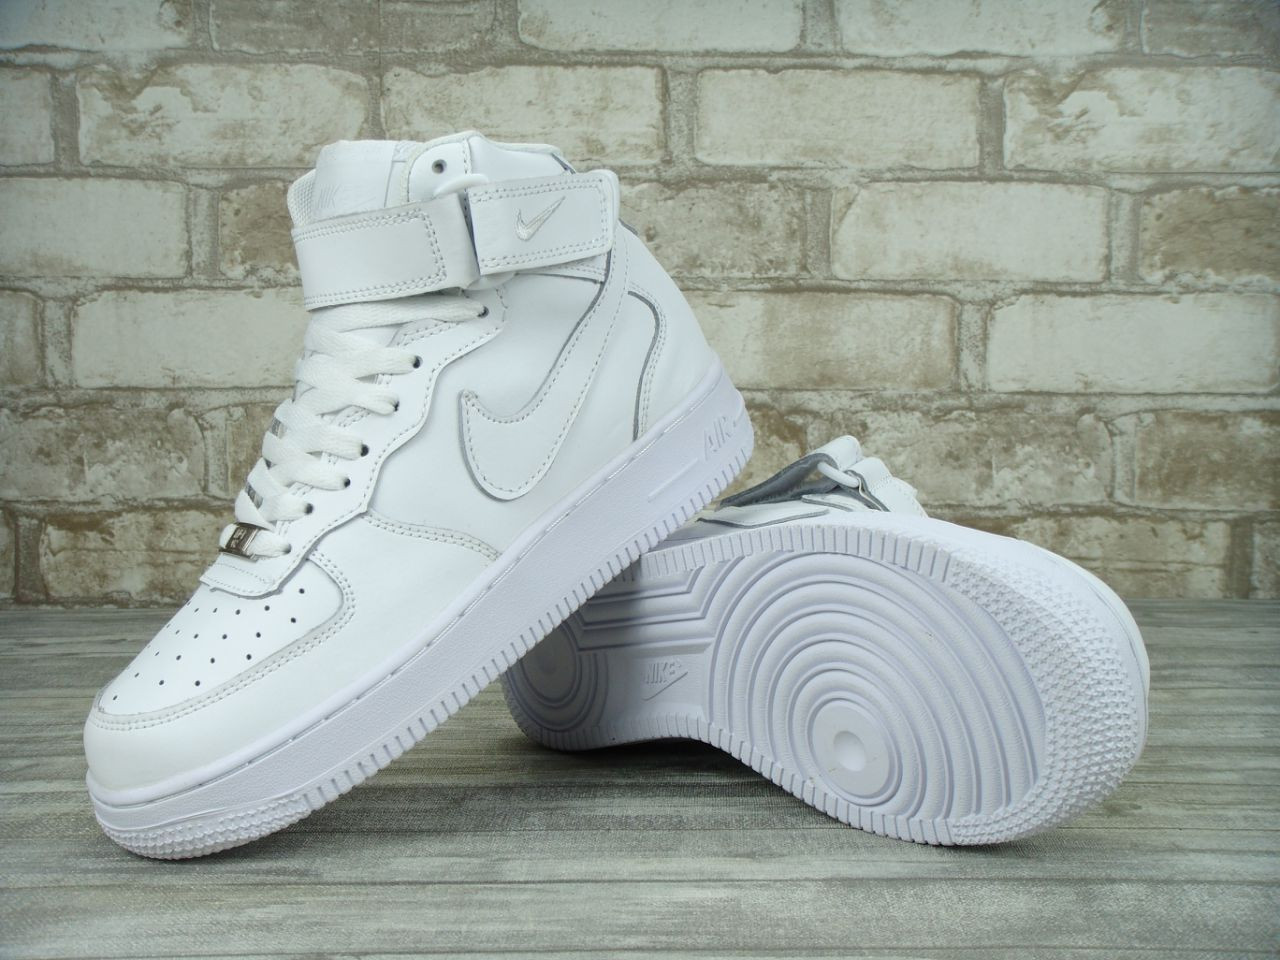 best website f9d27 2f55d Кроссовки женские Nike Air Force 1 Mid White Реплика Реплика 39